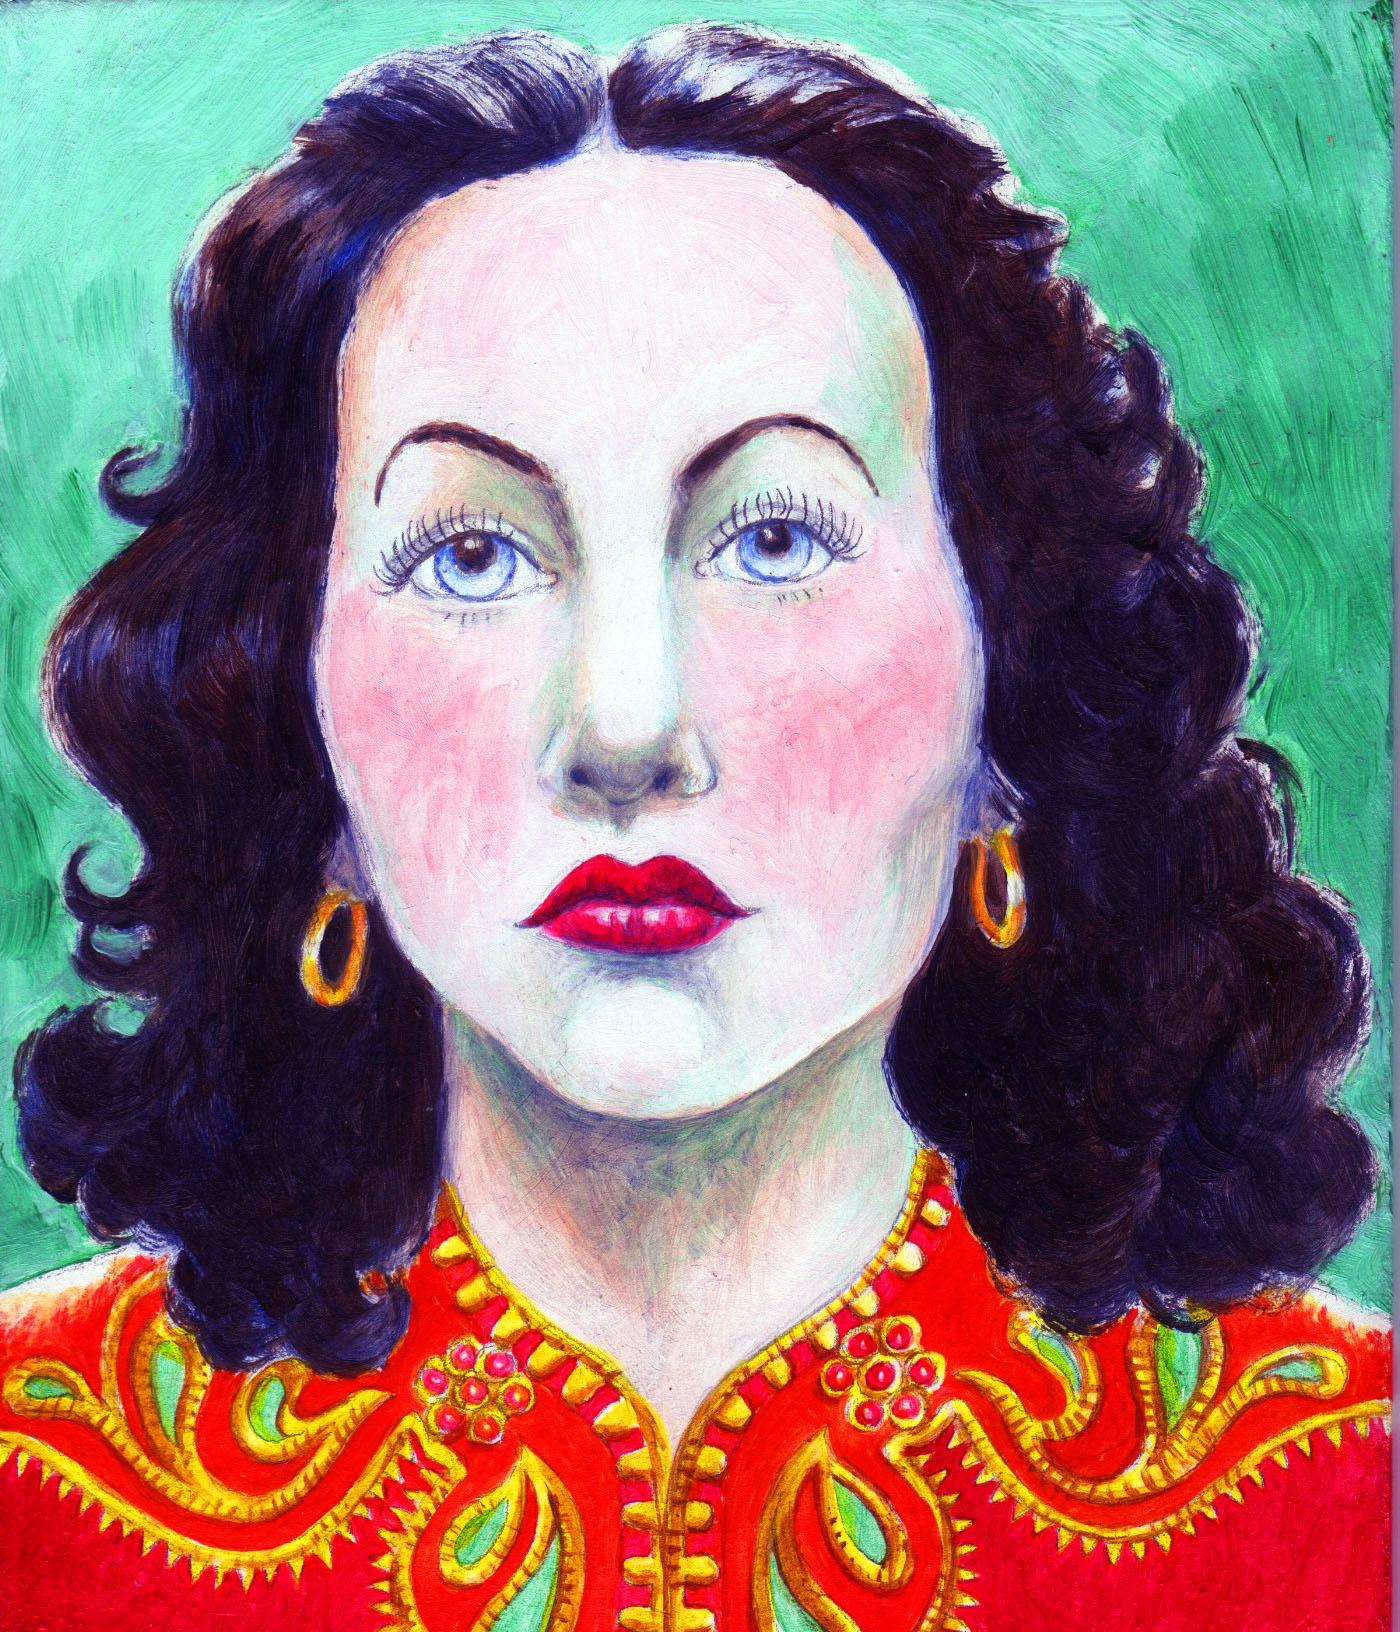 painting of Hedi Lamarr